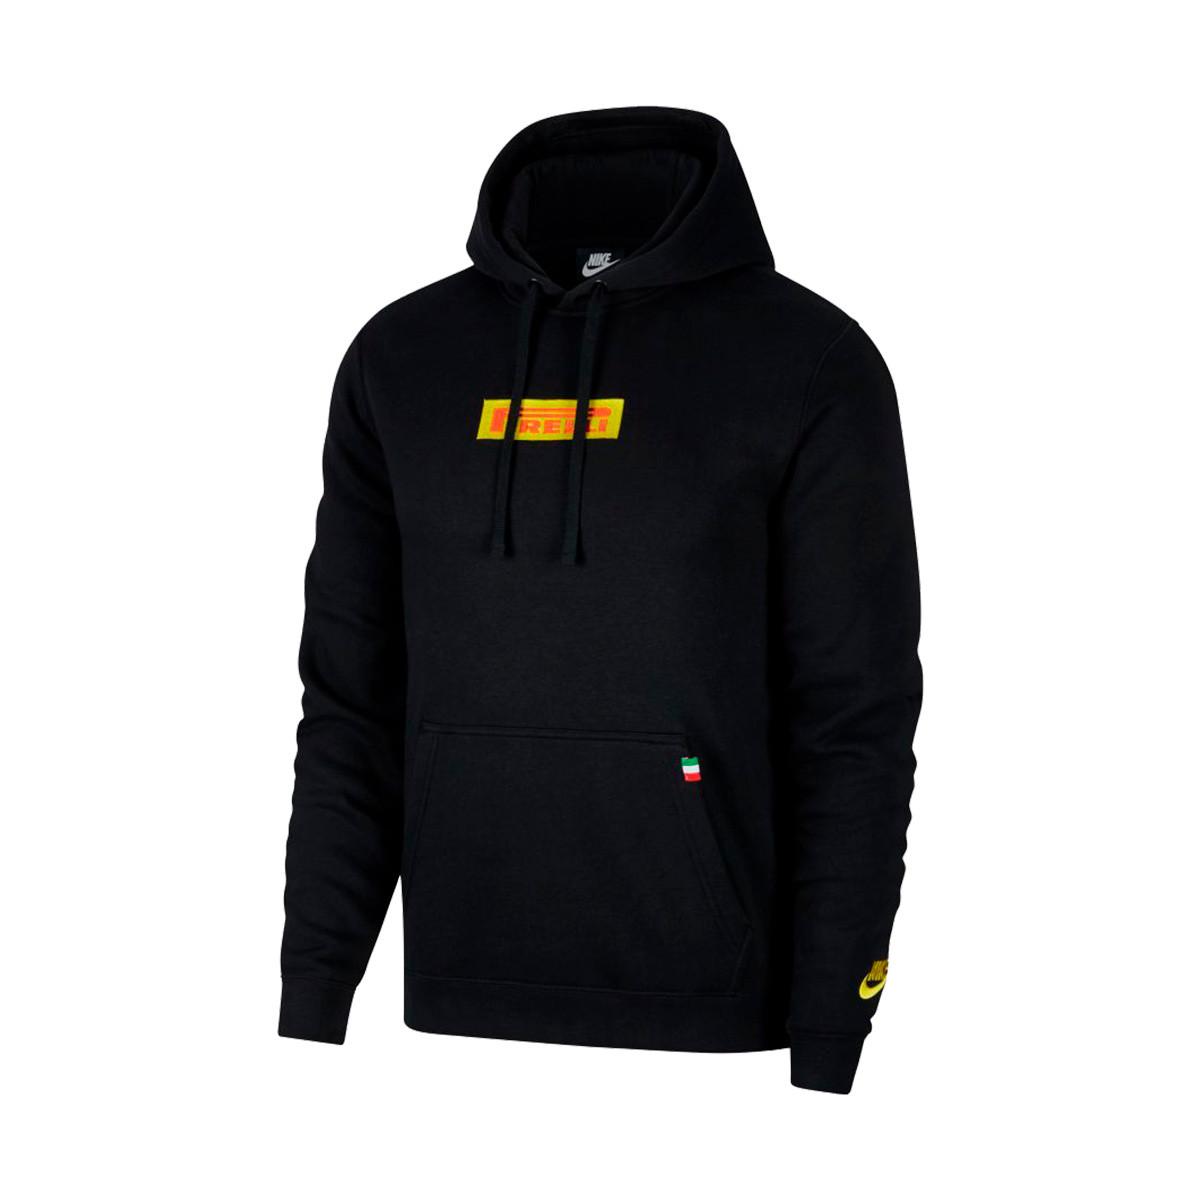 nike black and yellow hoodie